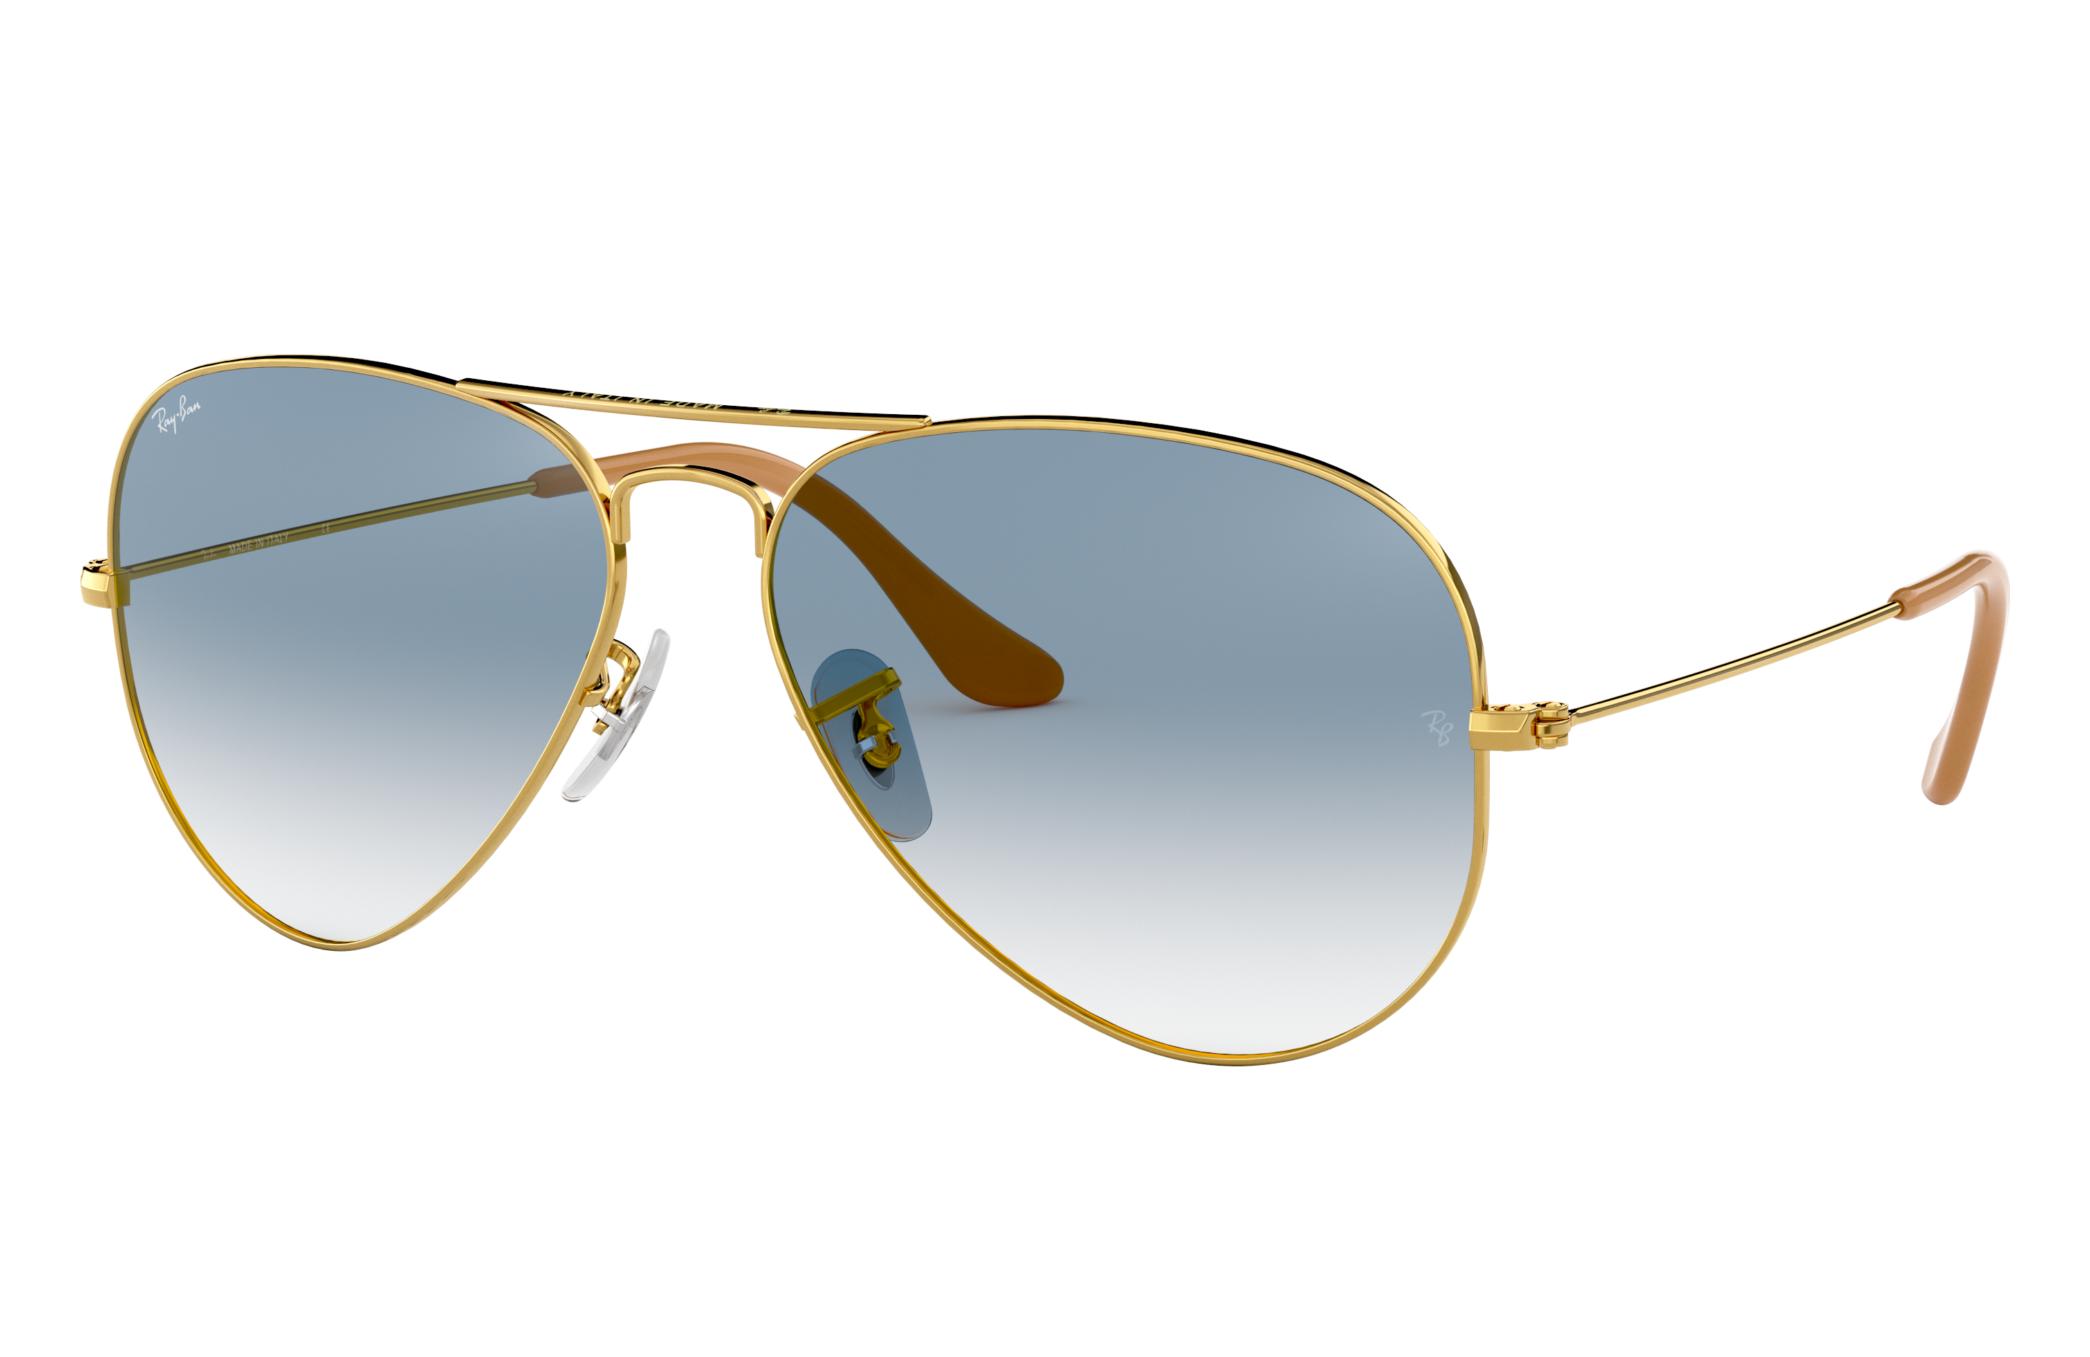 Ray-Ban Aviator Gradient Gold, Blue Lenses - RB3025